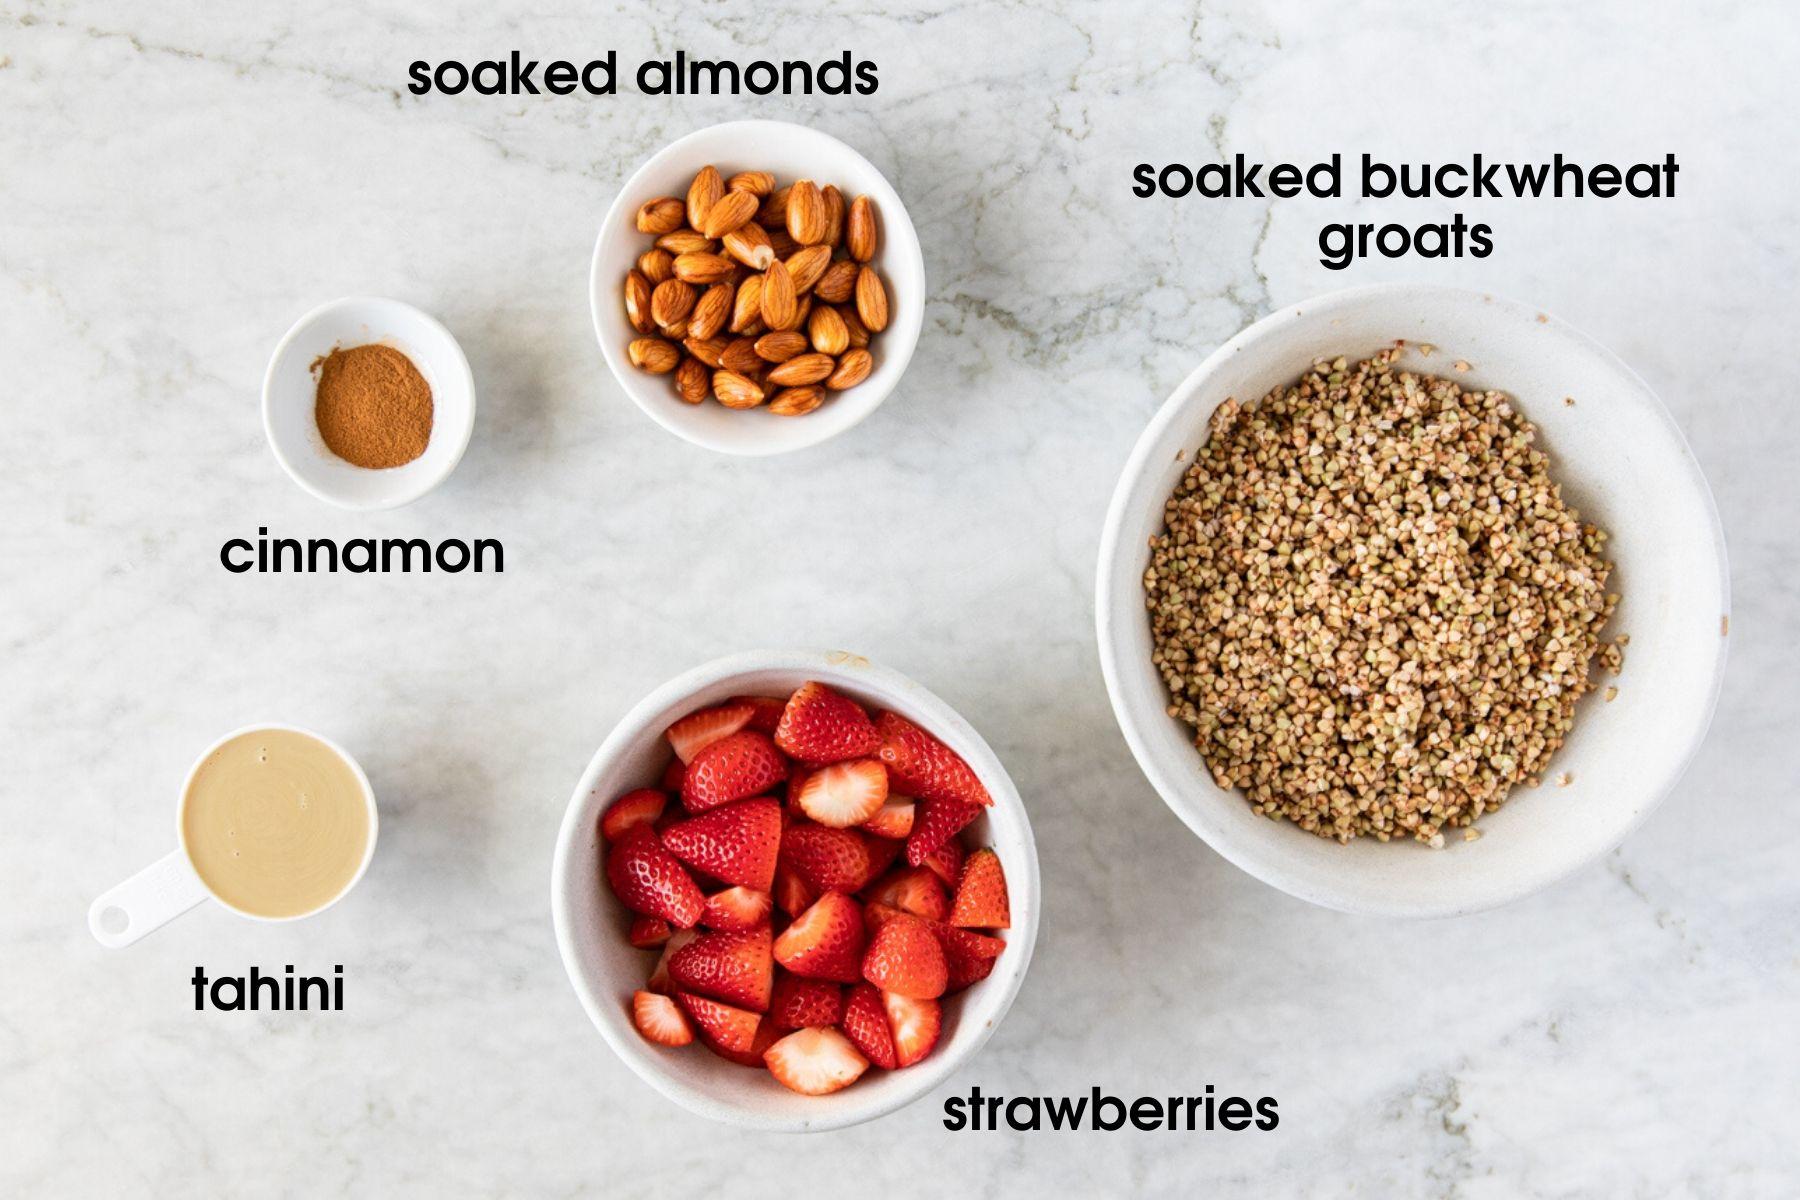 bowls with ingredients to make vegan raw buckwheat groats porridge including cinnamon, soaked almonds, soaked buckwheat groats, strawberries and tahini